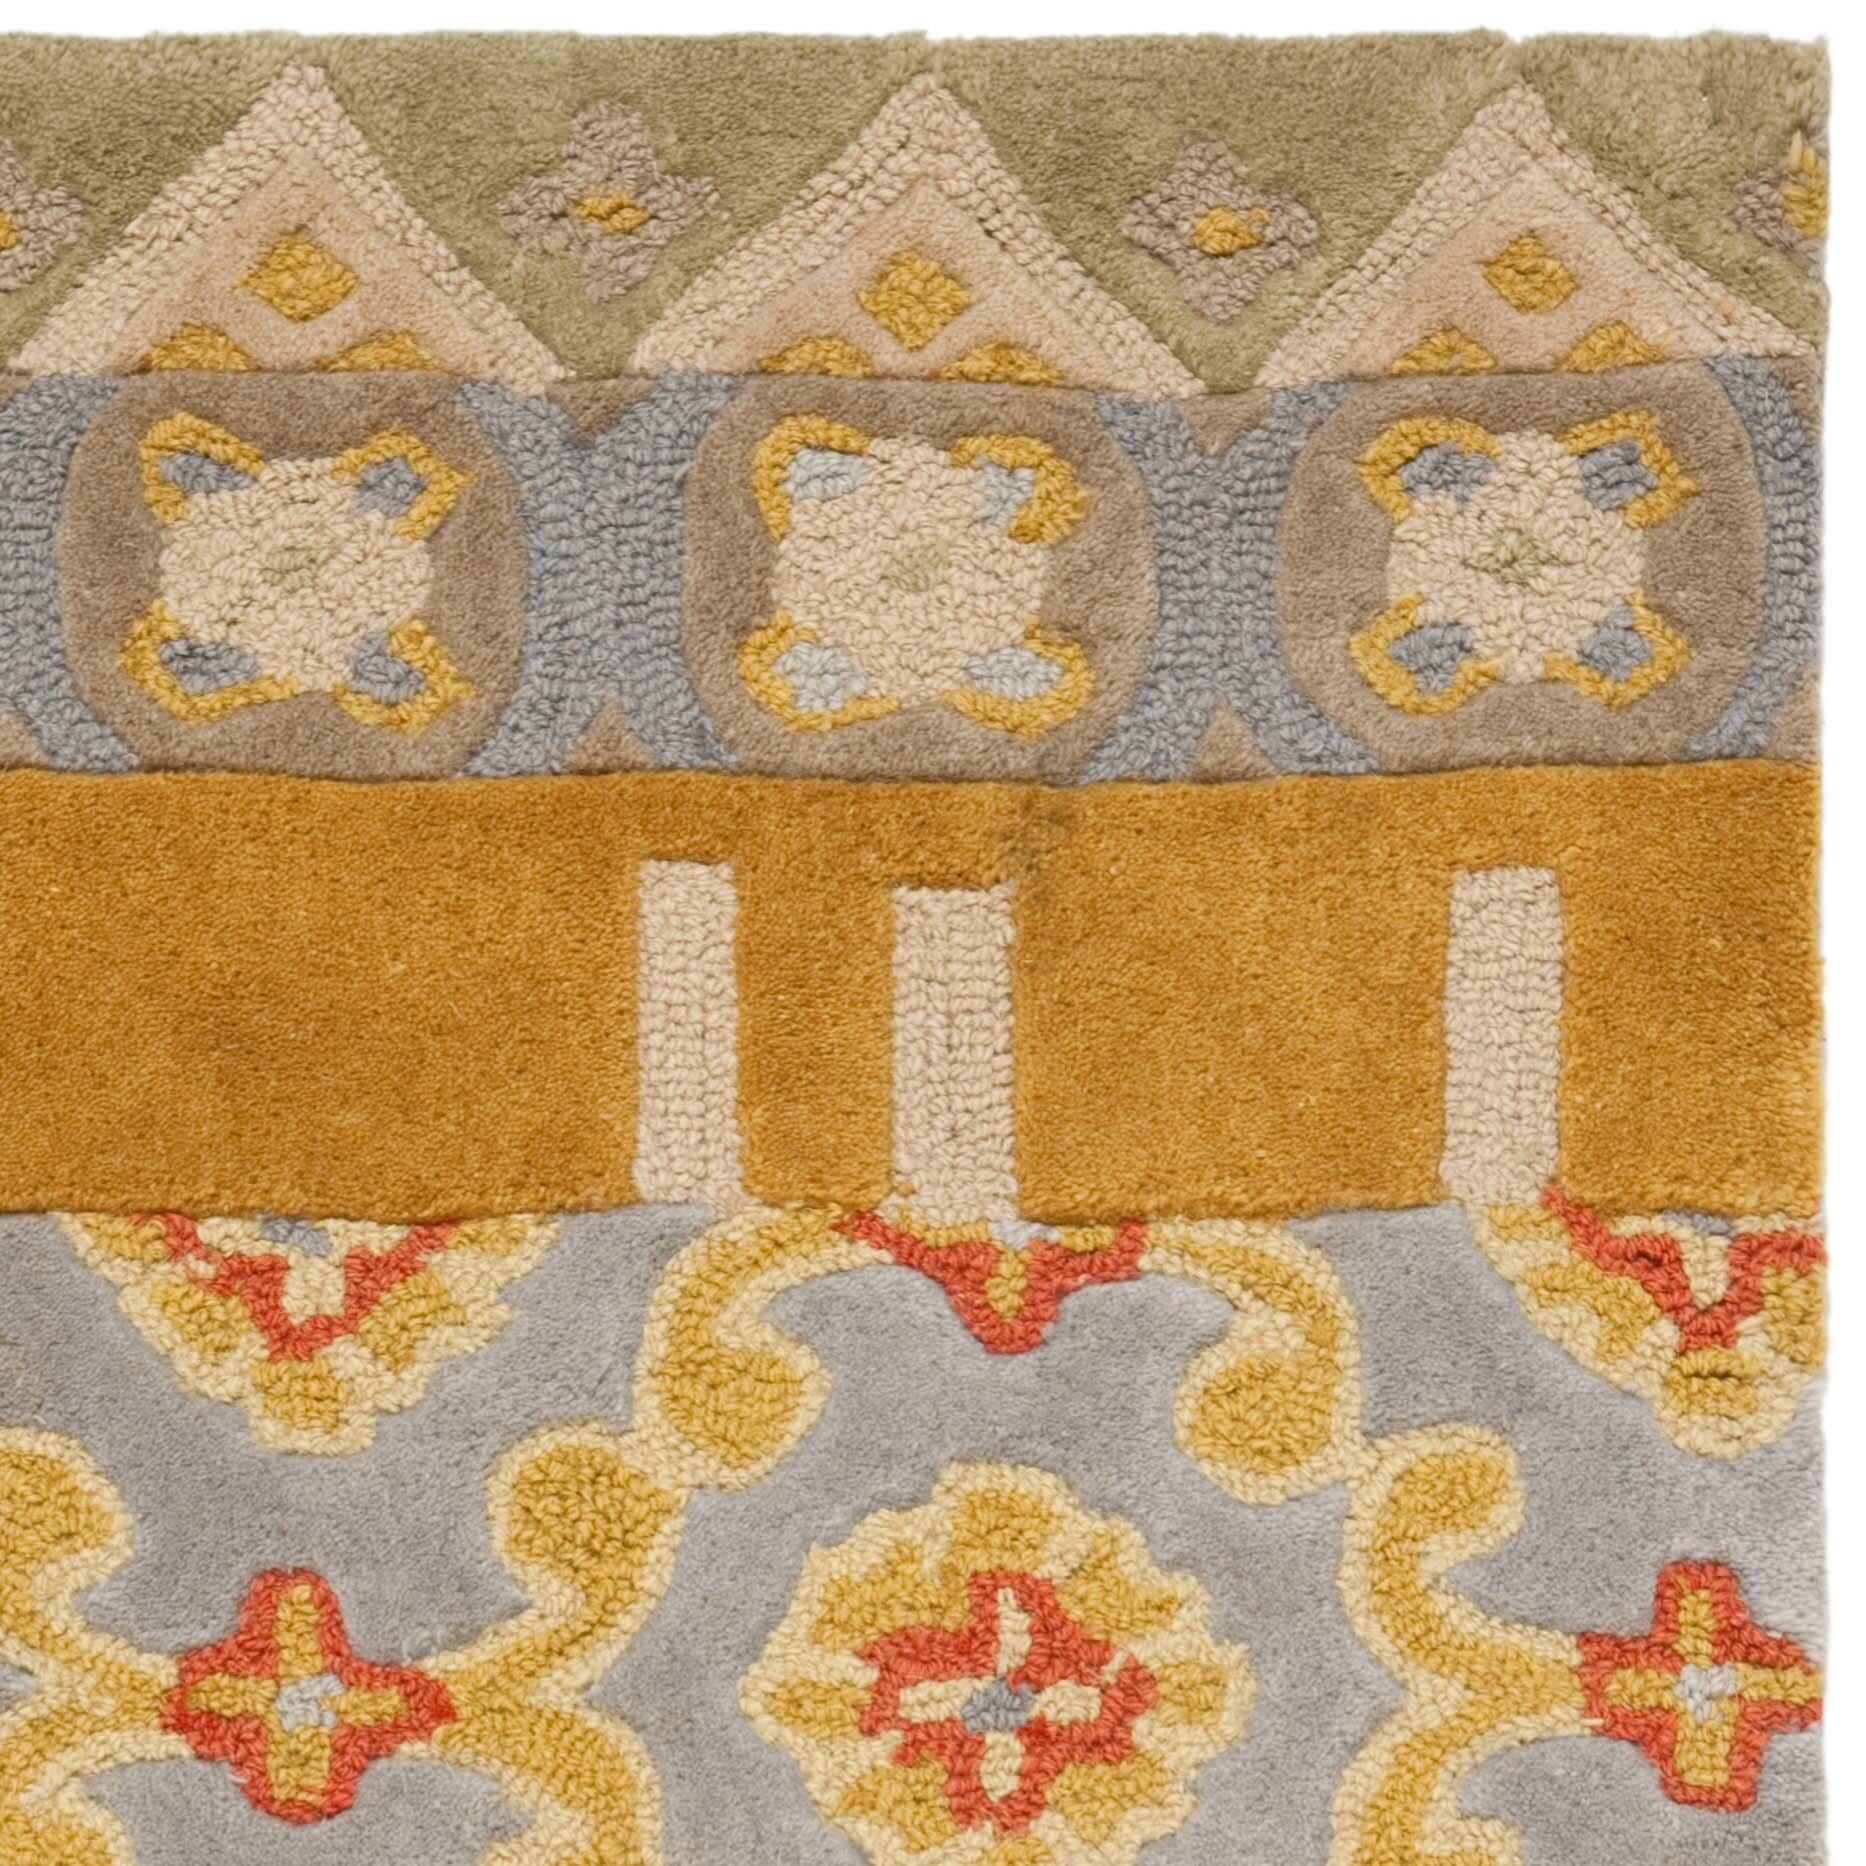 Safavieh rodeo drive area rug reviews wayfair for Safavieh rugs